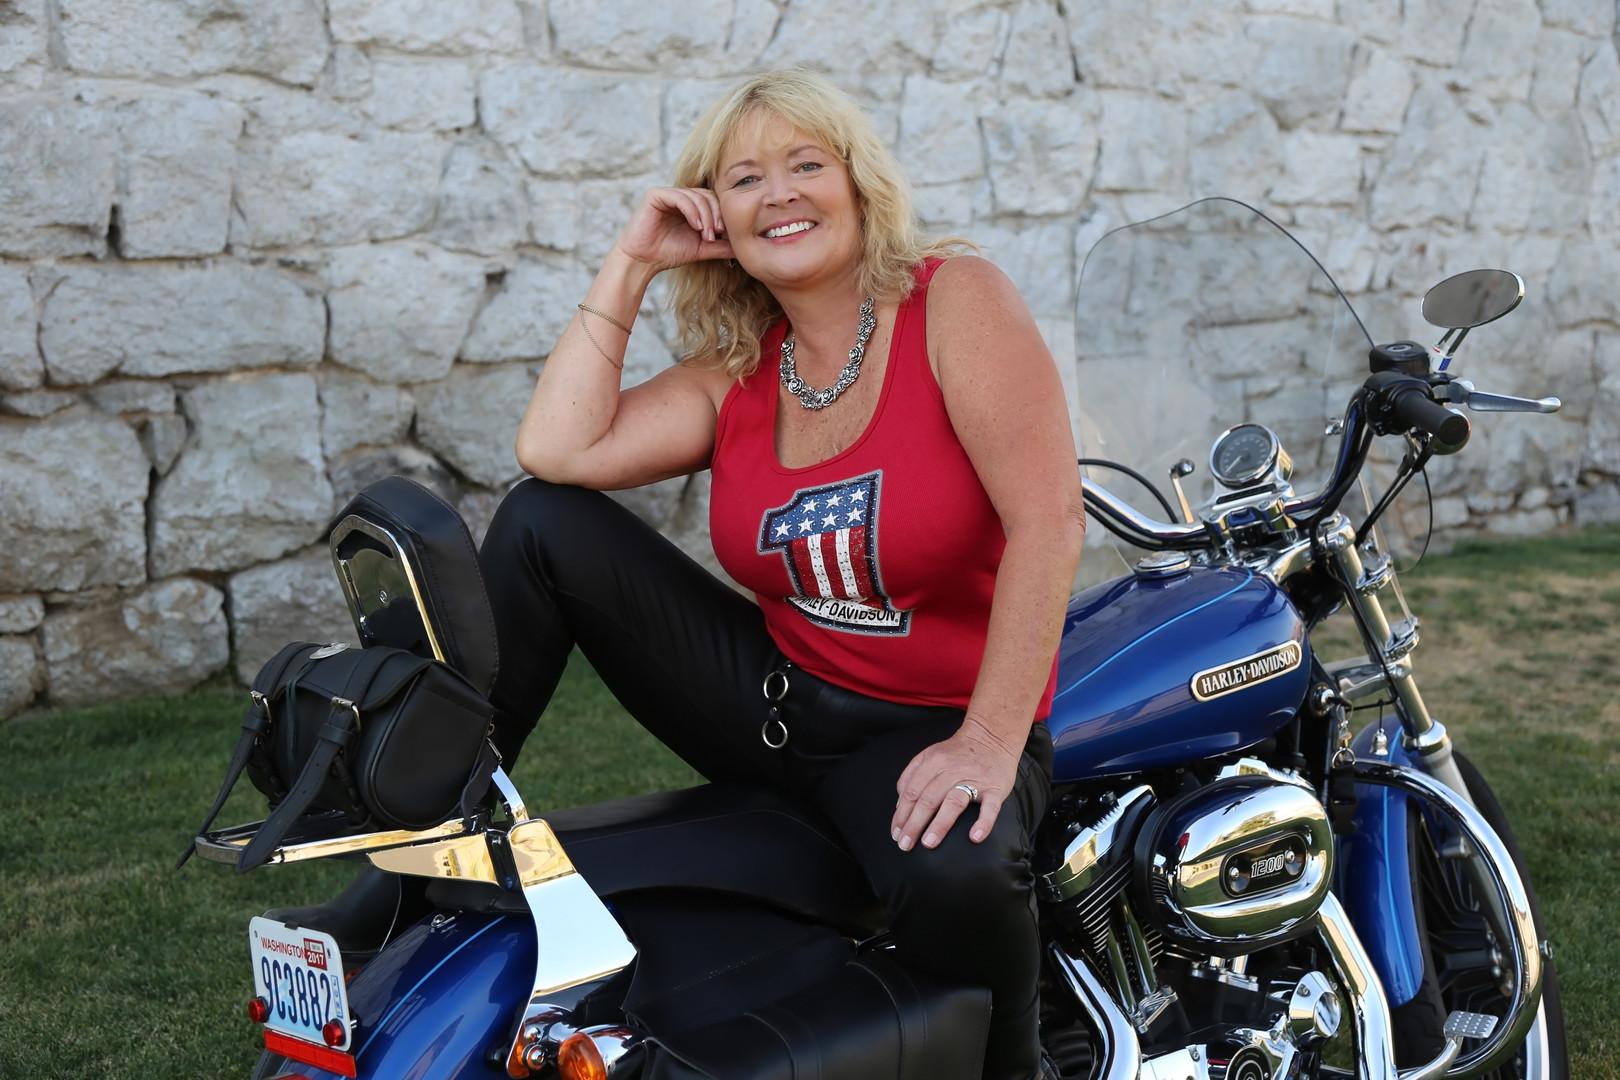 Blonde woman on motorcycle